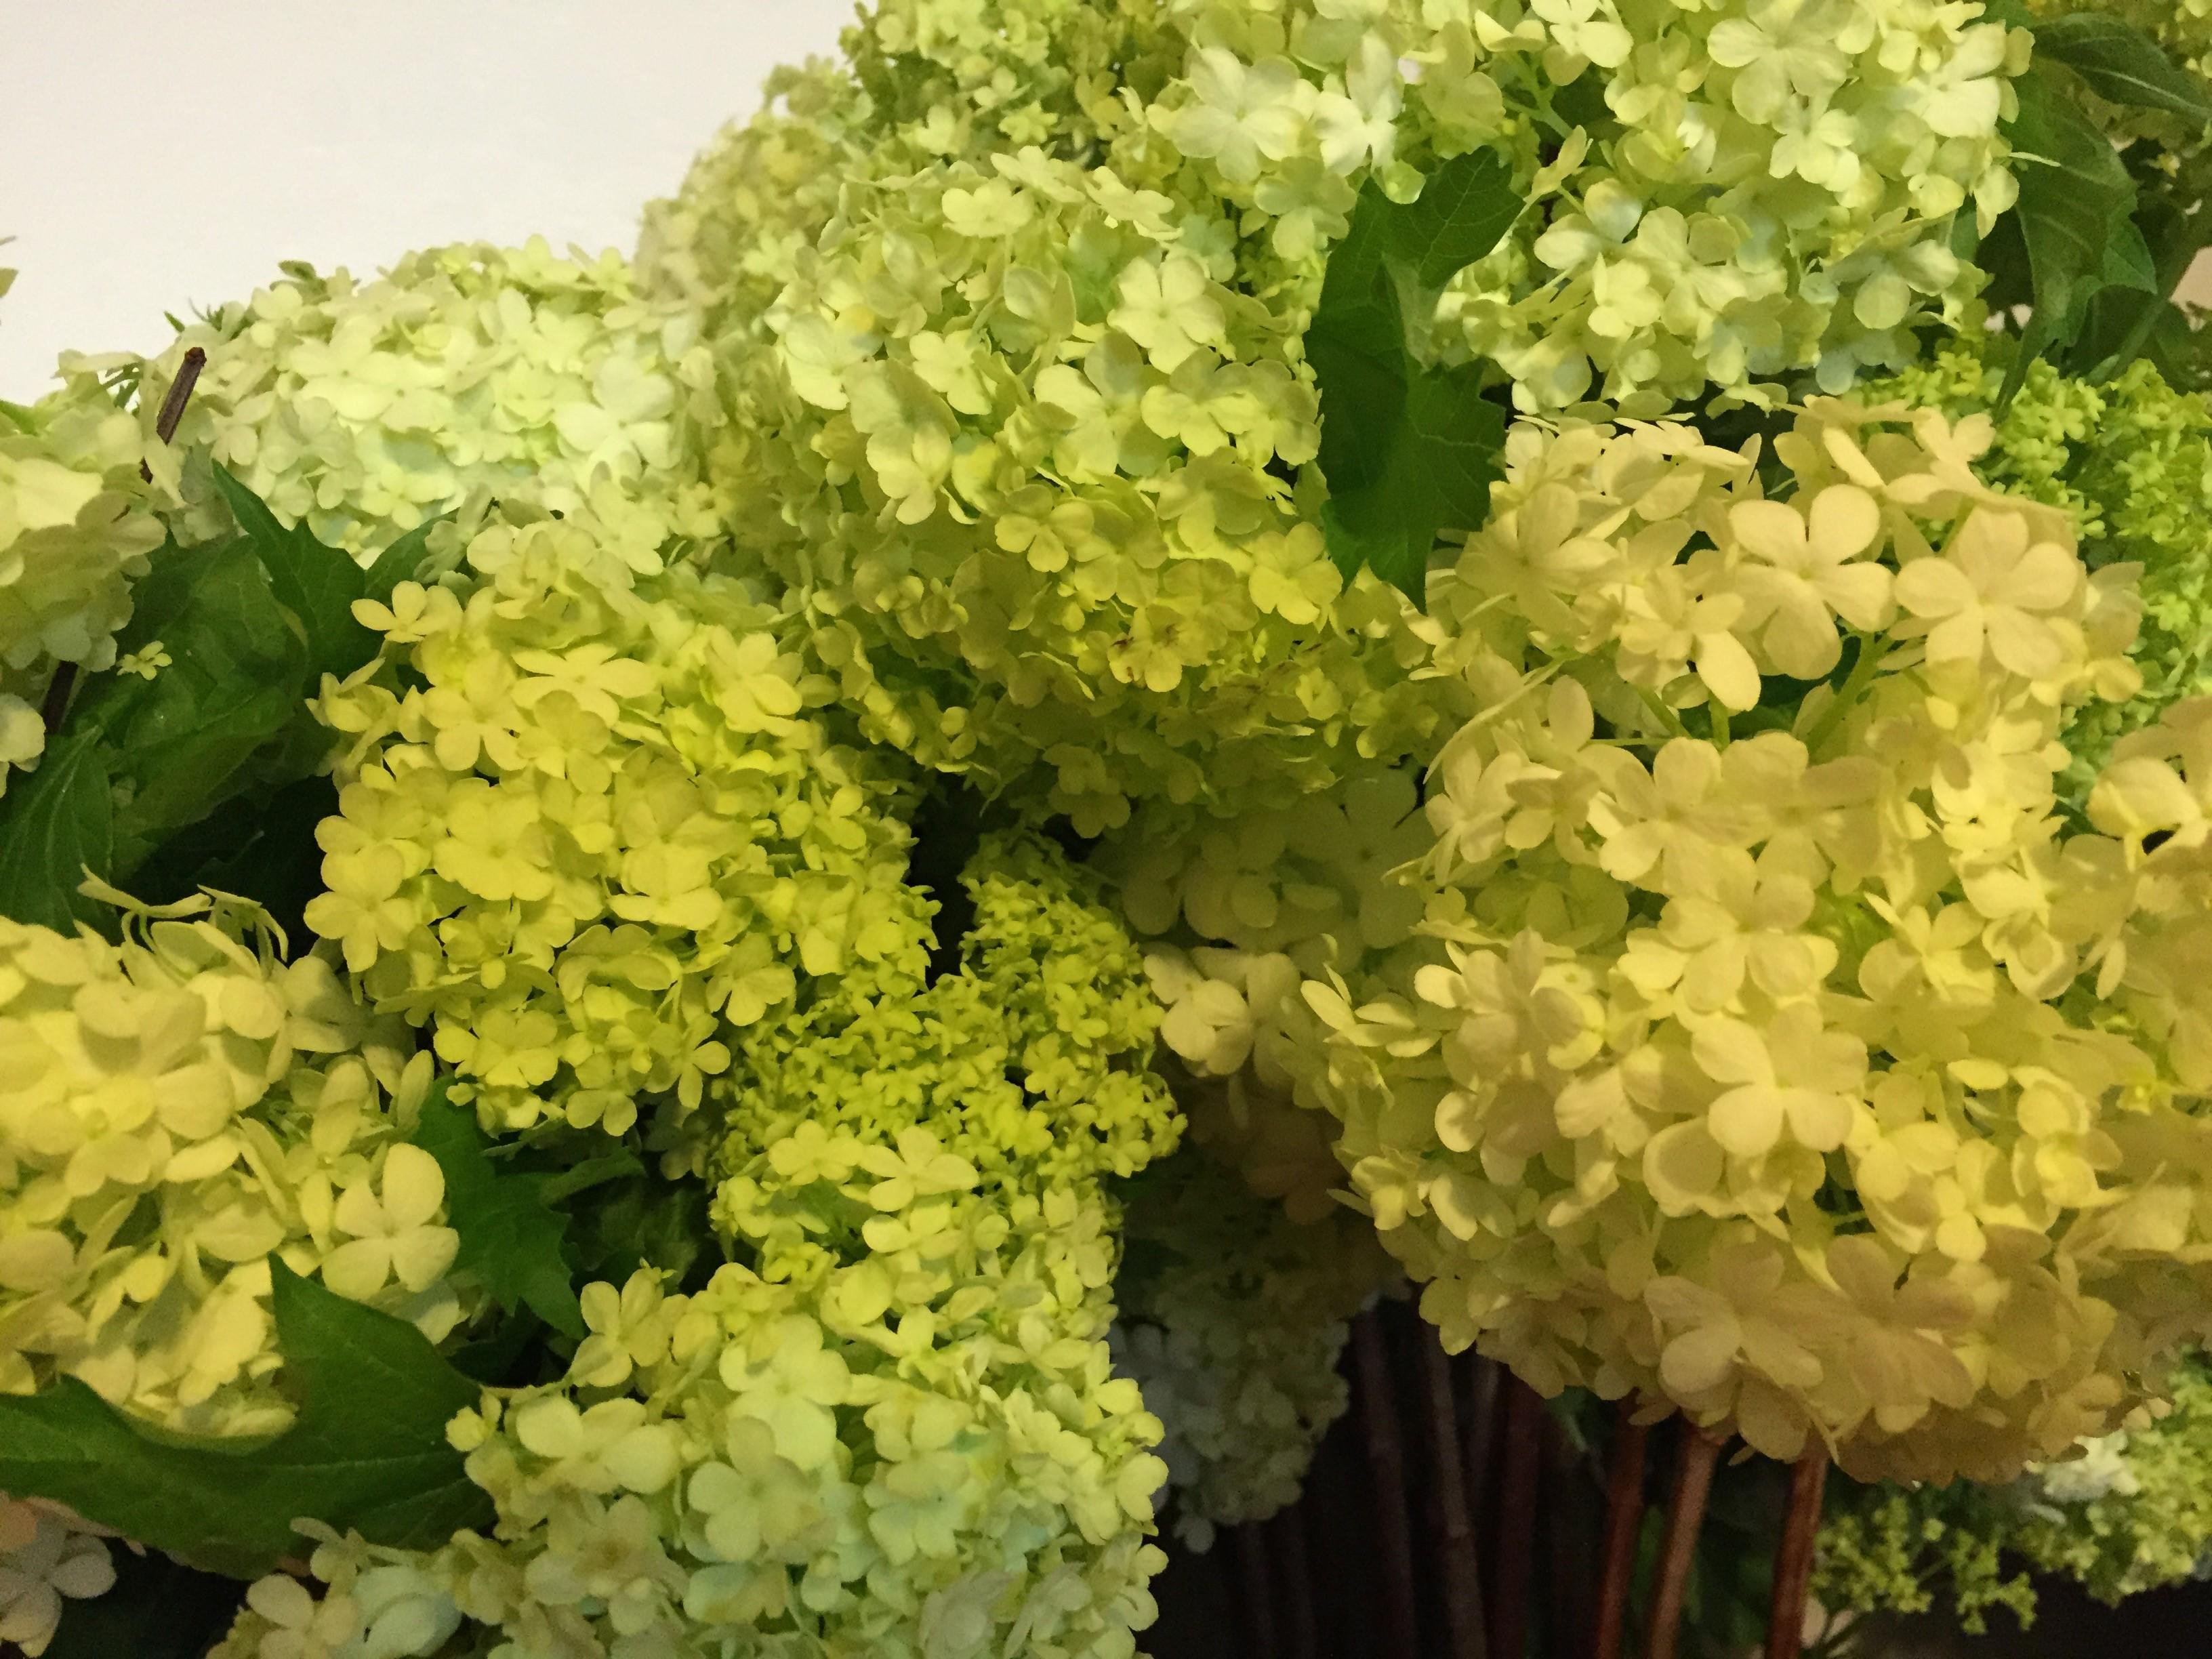 IMG 1276 e1423691178838 - Valentine's Day Flower PARADISE!